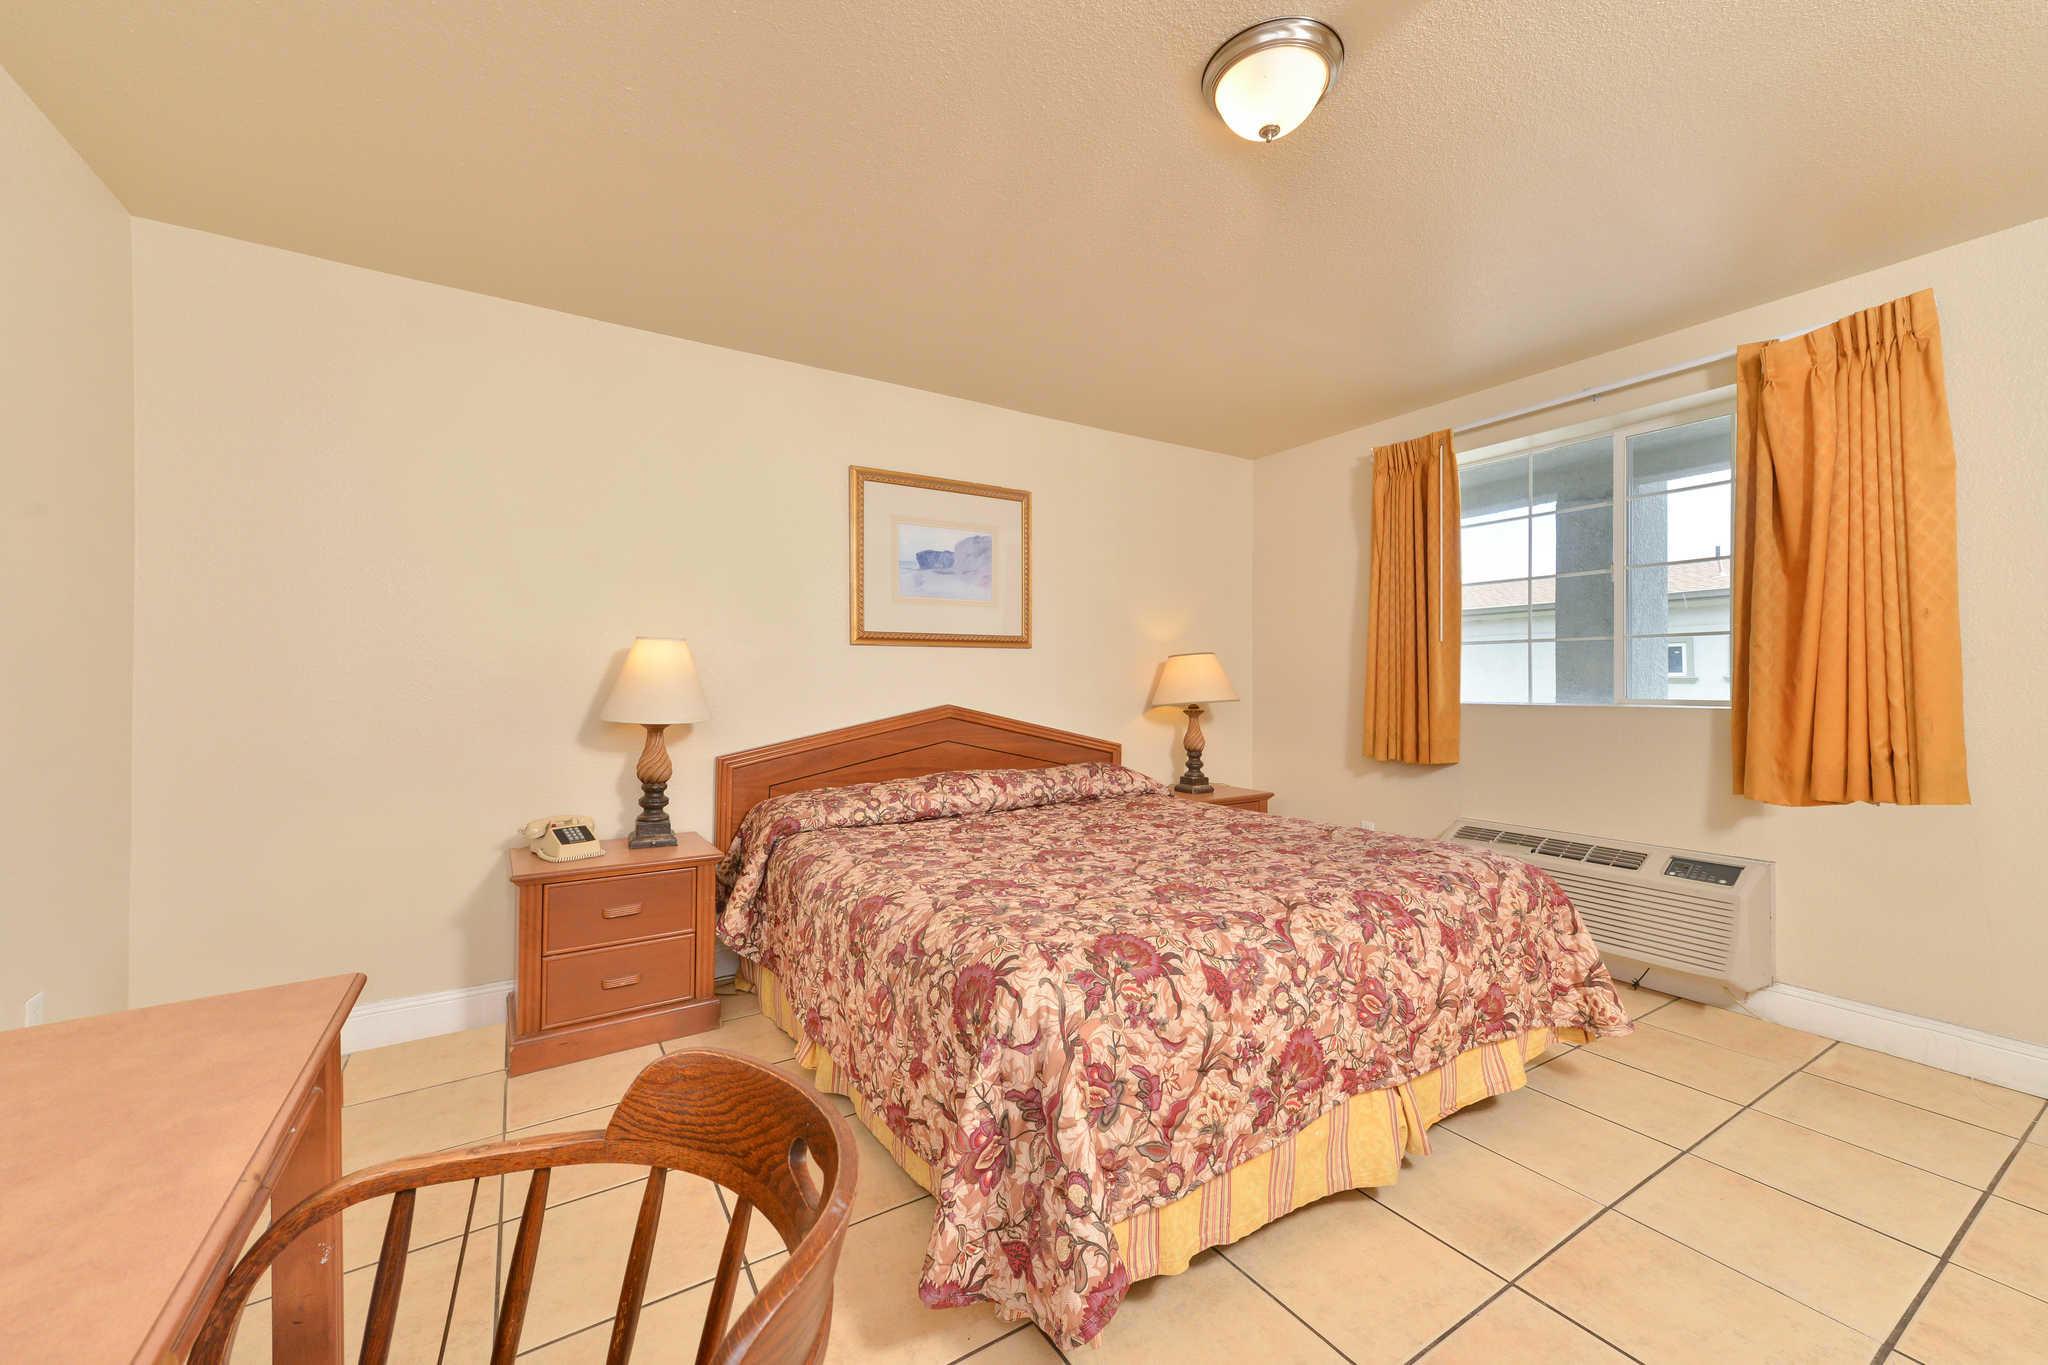 Rent A Room Near Stockton Ca